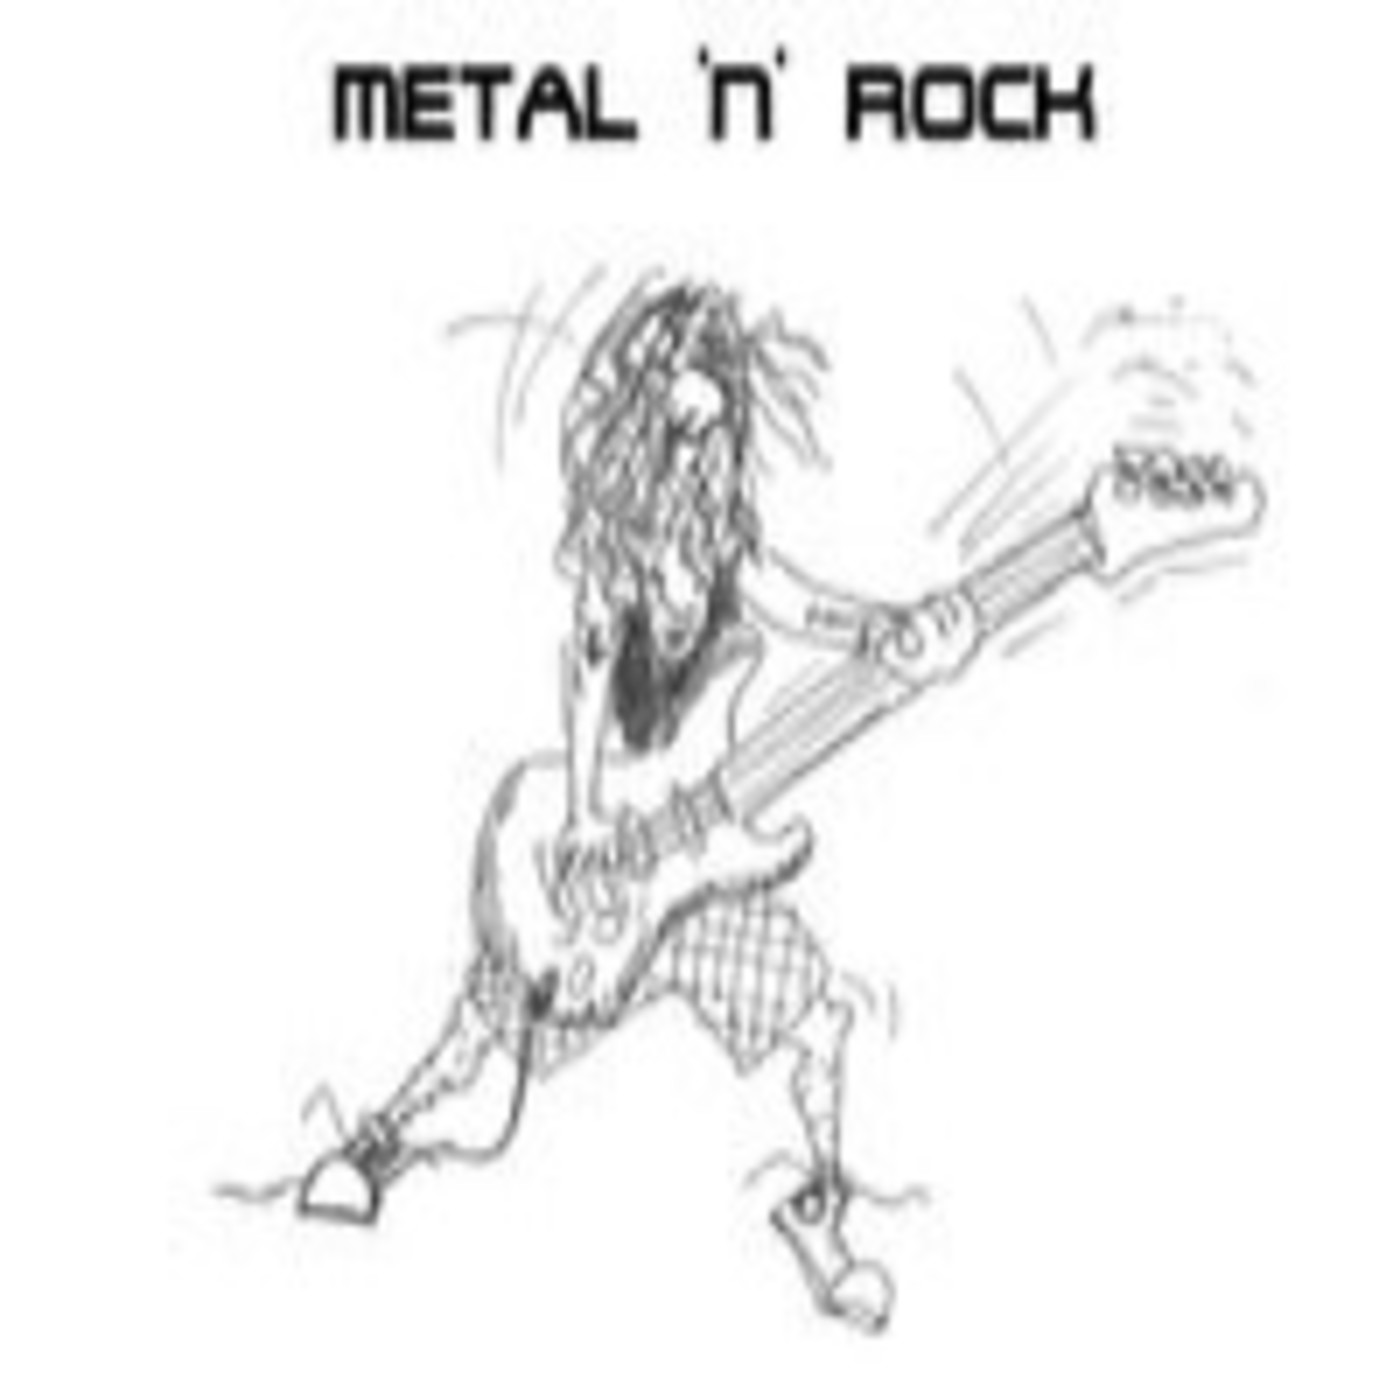 Monografico Iron Maiden En Monograficos Metal N